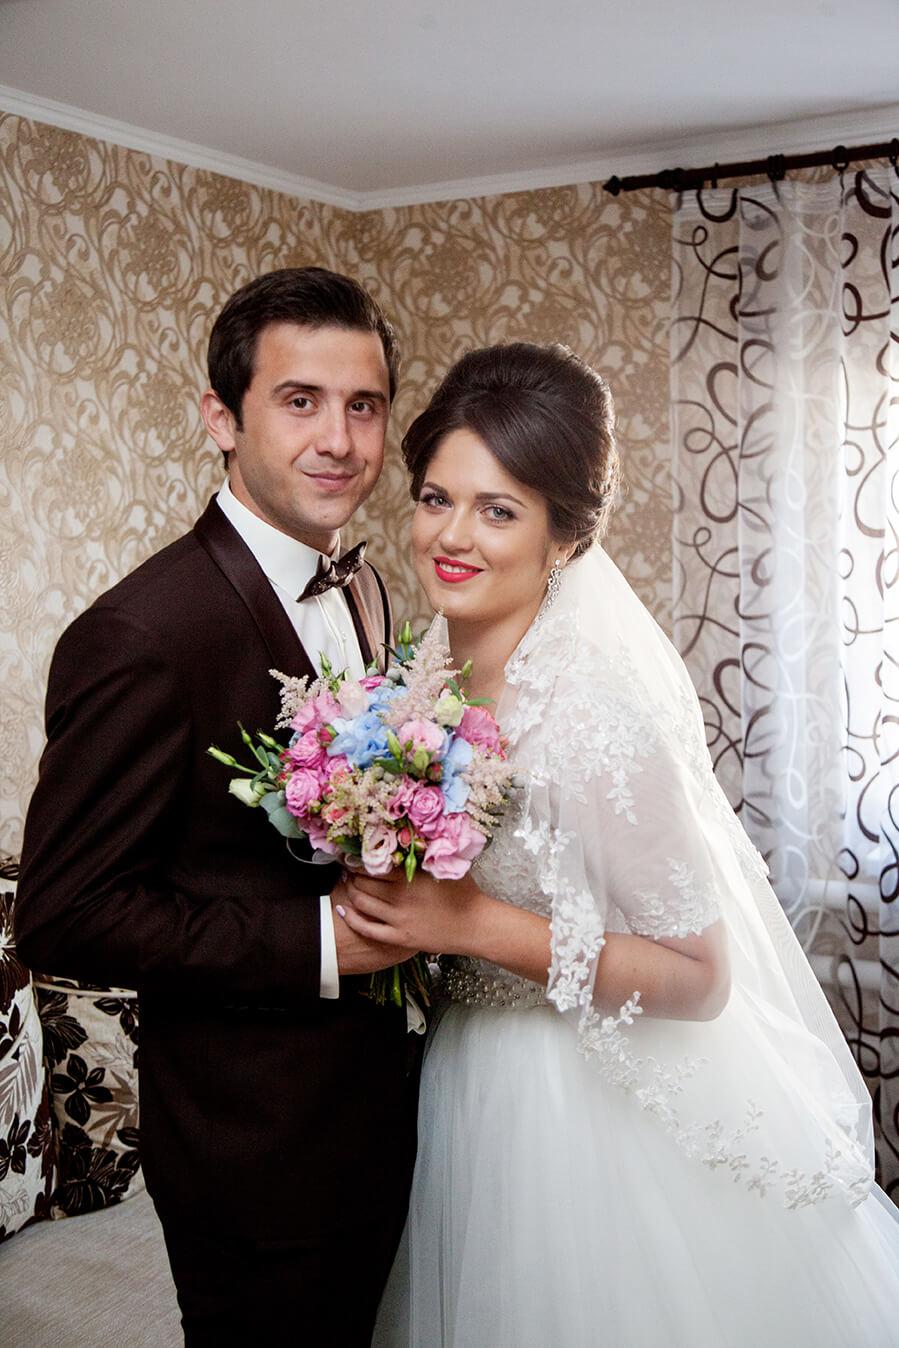 vykup-vstrecha-zheniha-i-nevesty-svadebnoe-foto-fotograf-kiev-4